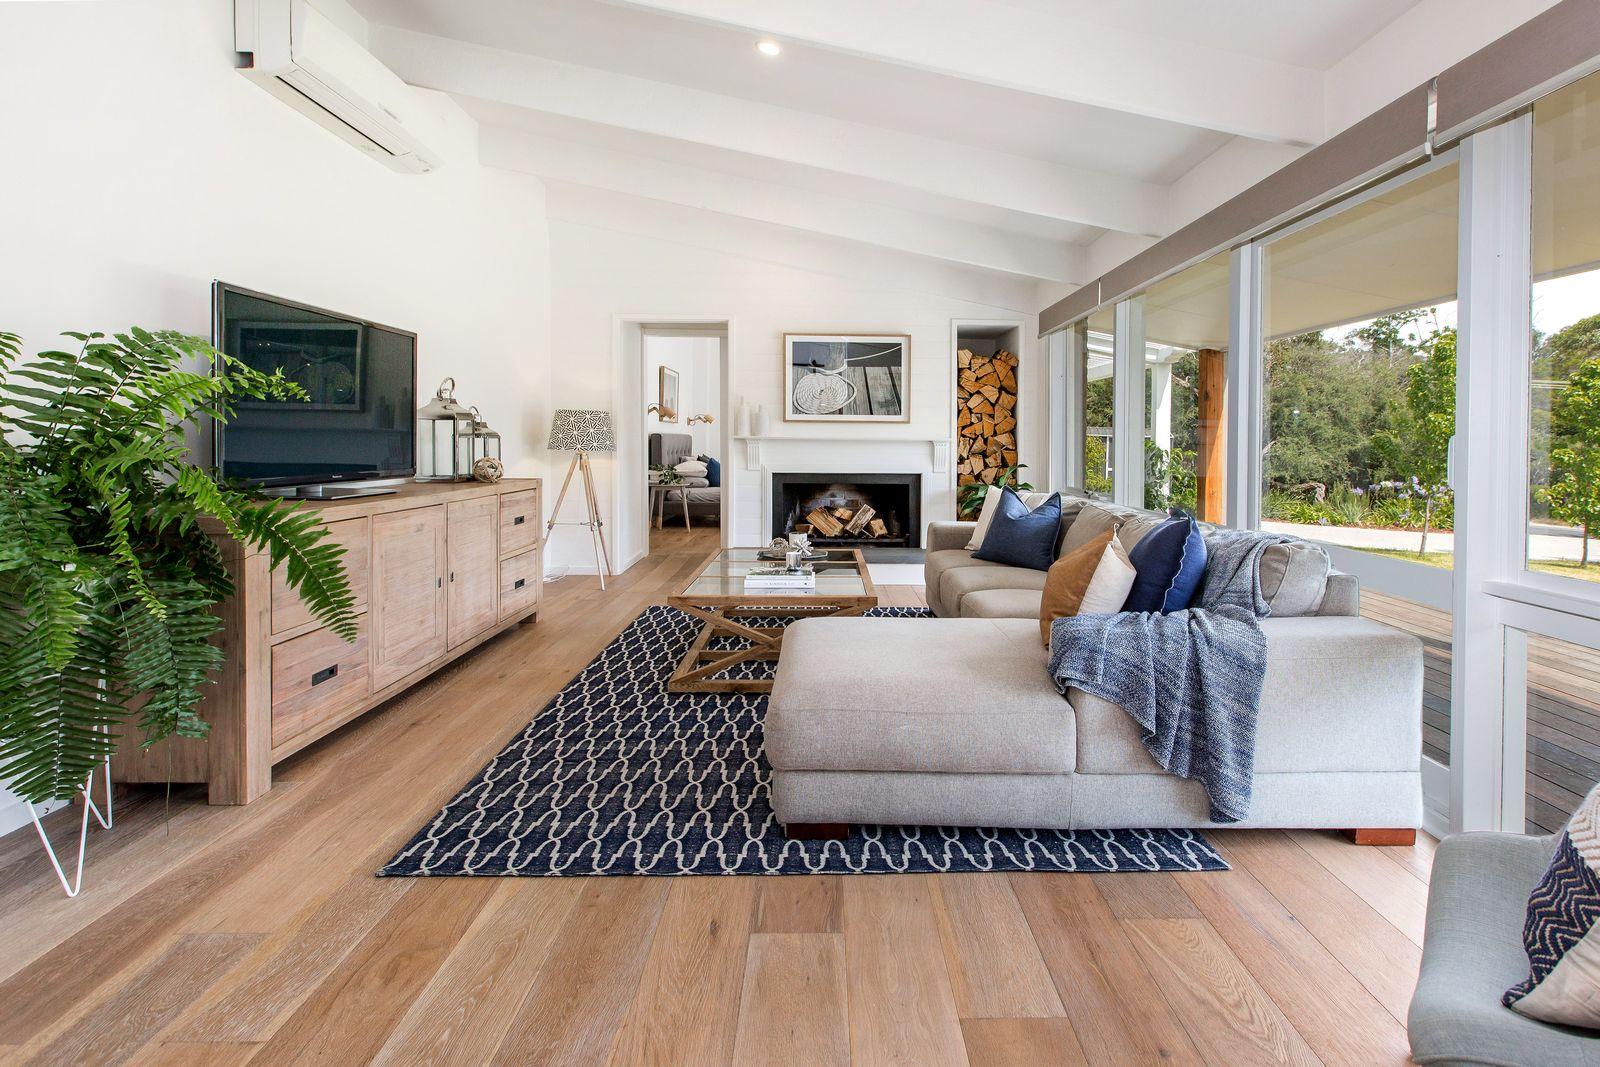 75 Kilburn Grove, Mt Martha SOLD FOR $1,800,000 FEB 2018